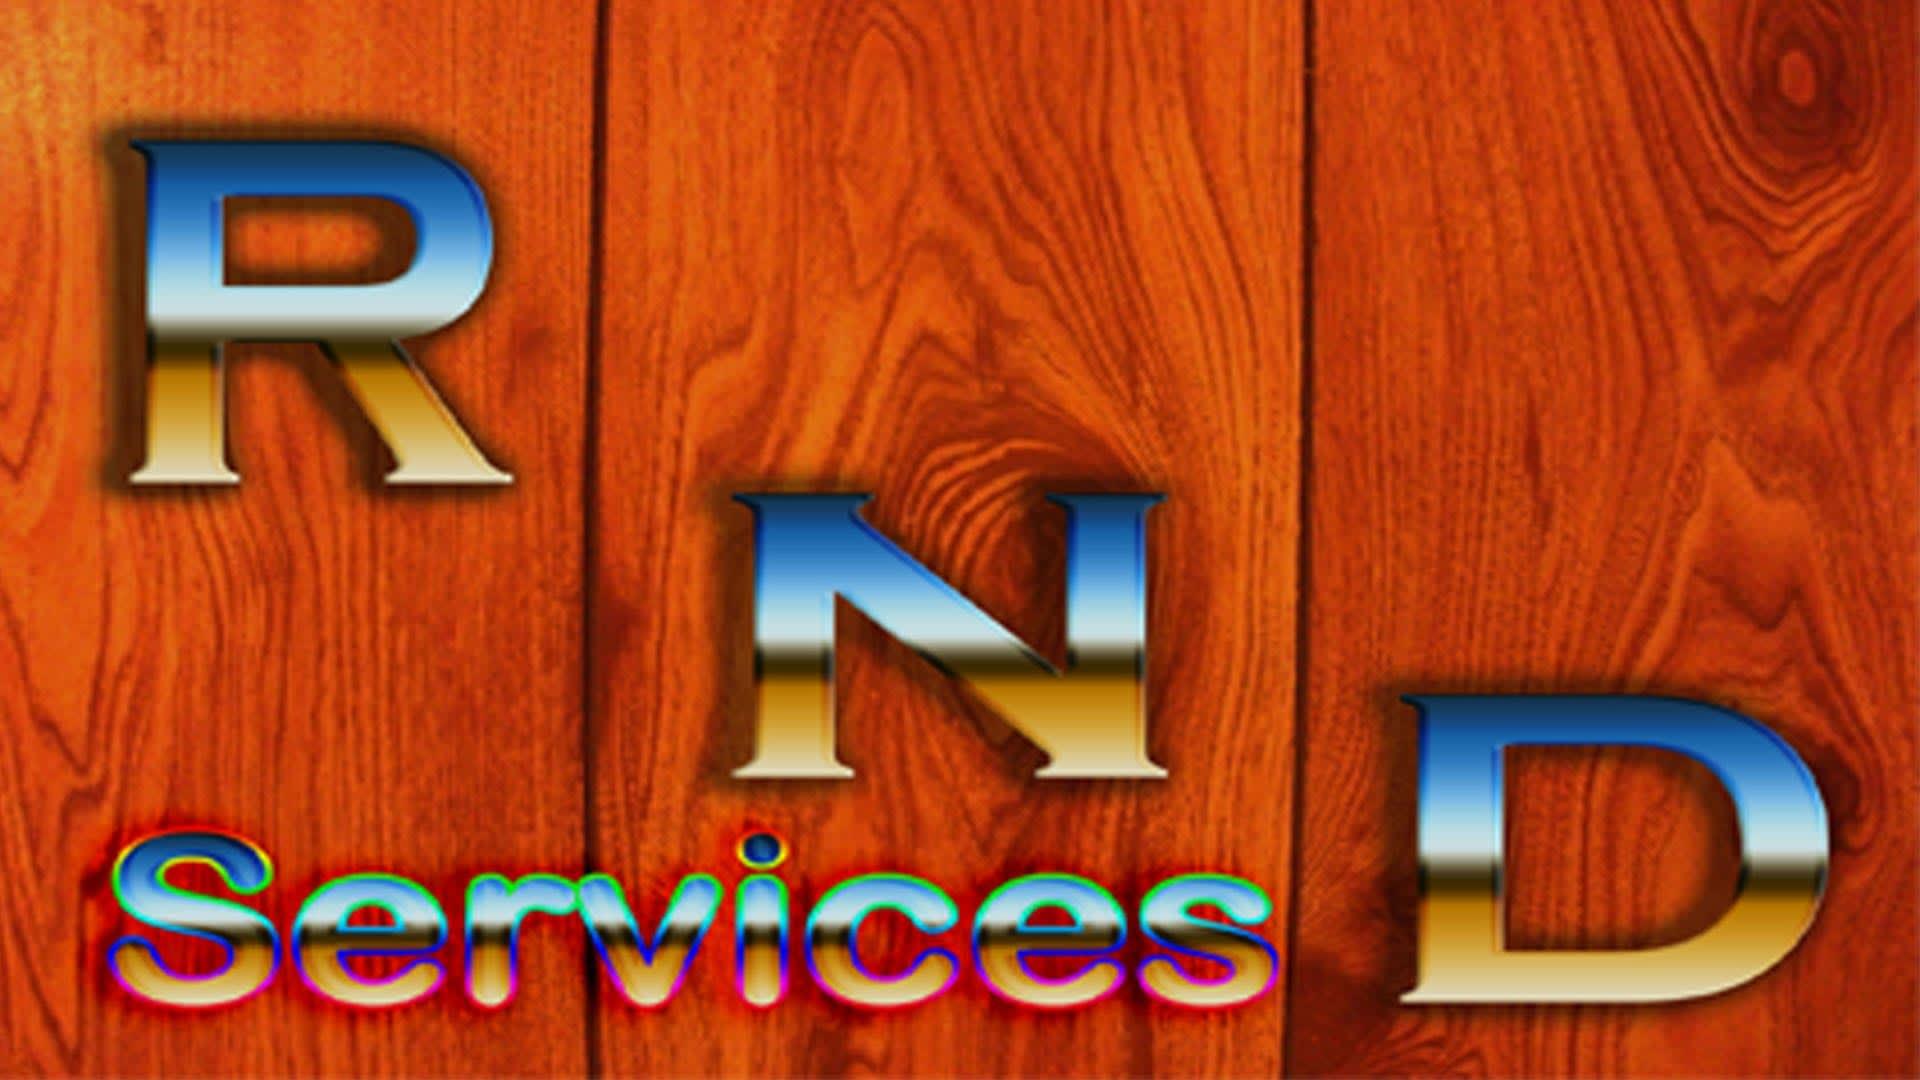 RnD Services